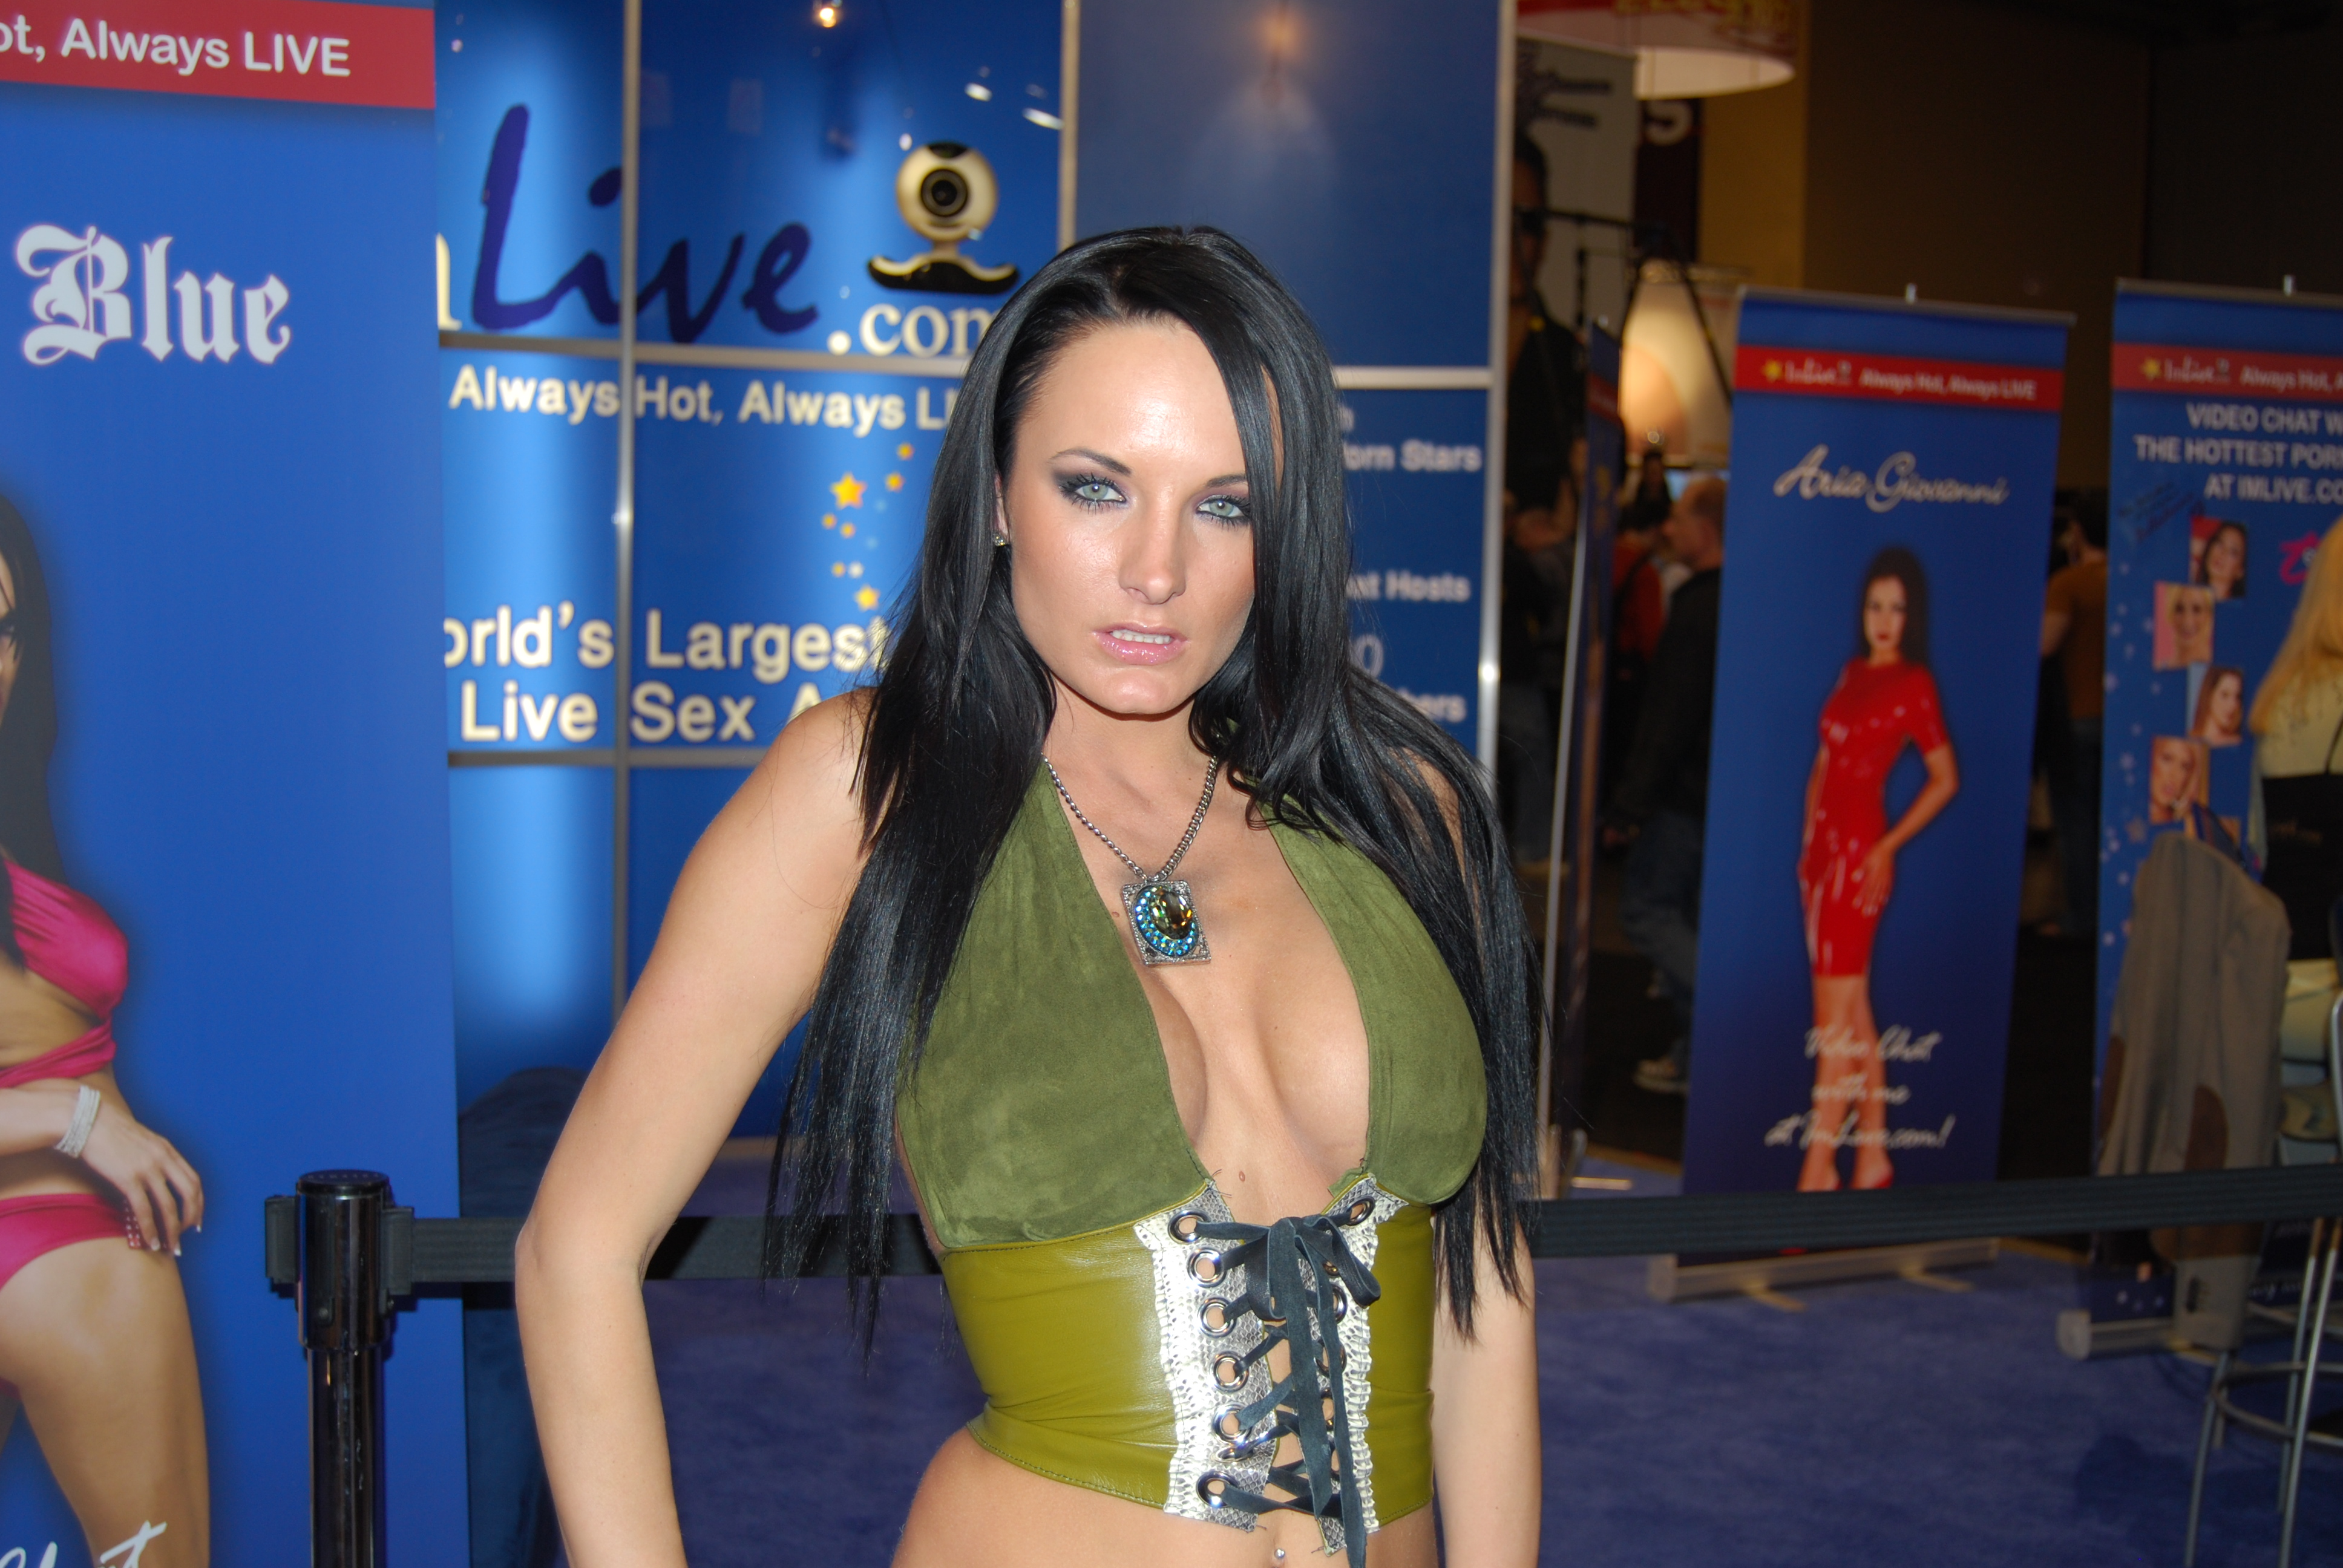 Found second Alektra blue pornstar European Cuckold